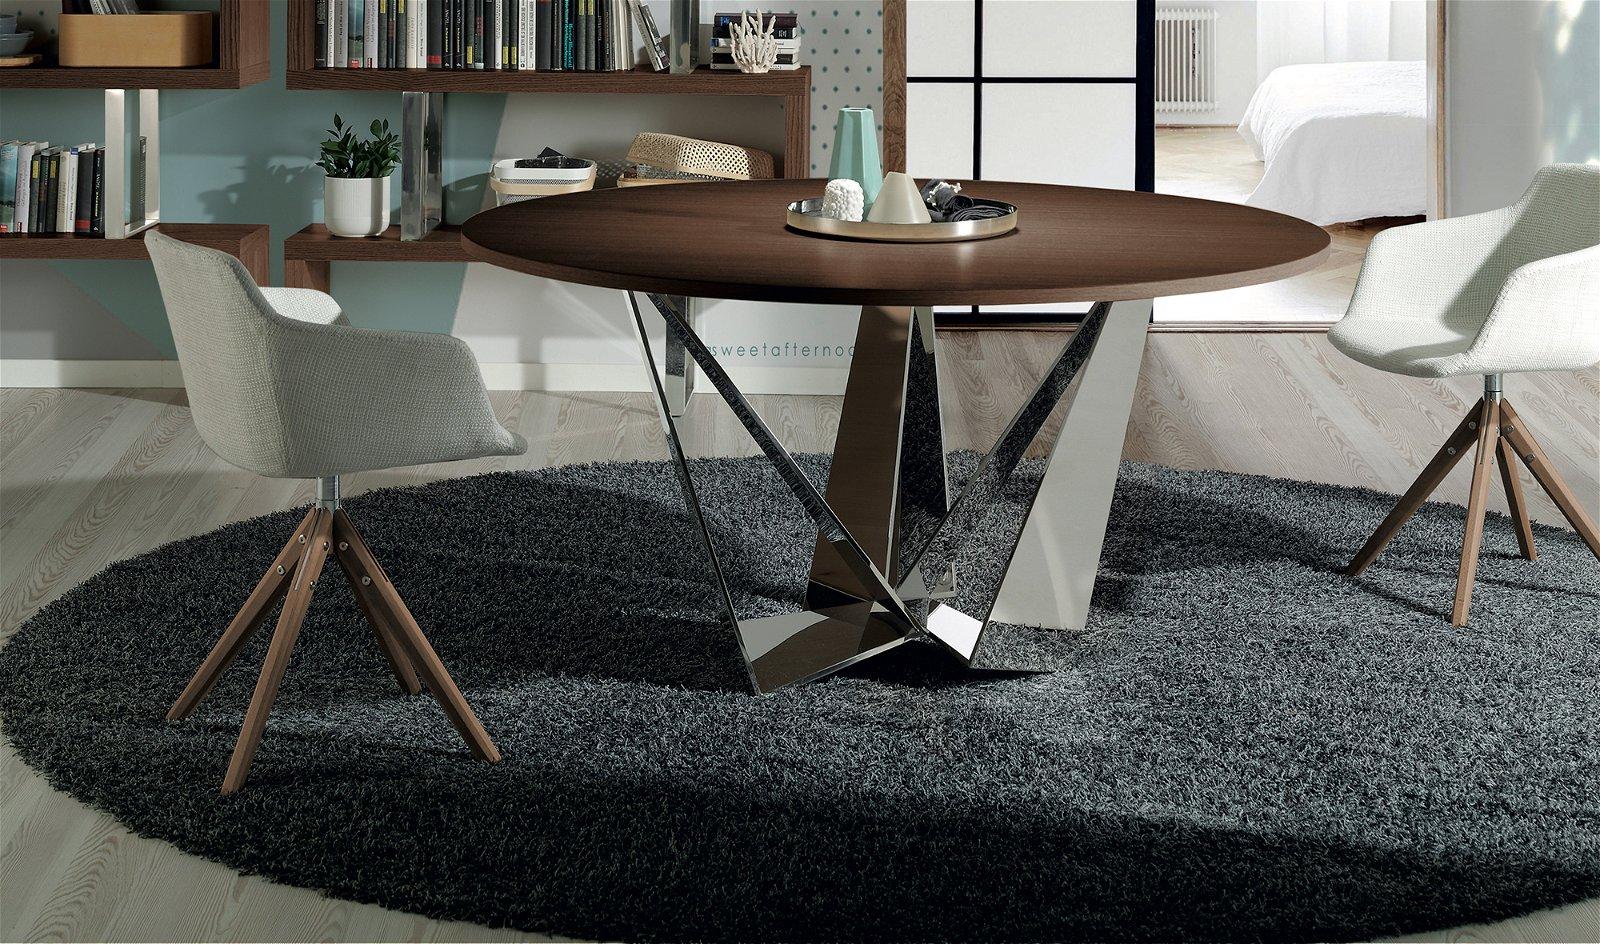 Silla Giratoria moderna tapizada y madera chieuti